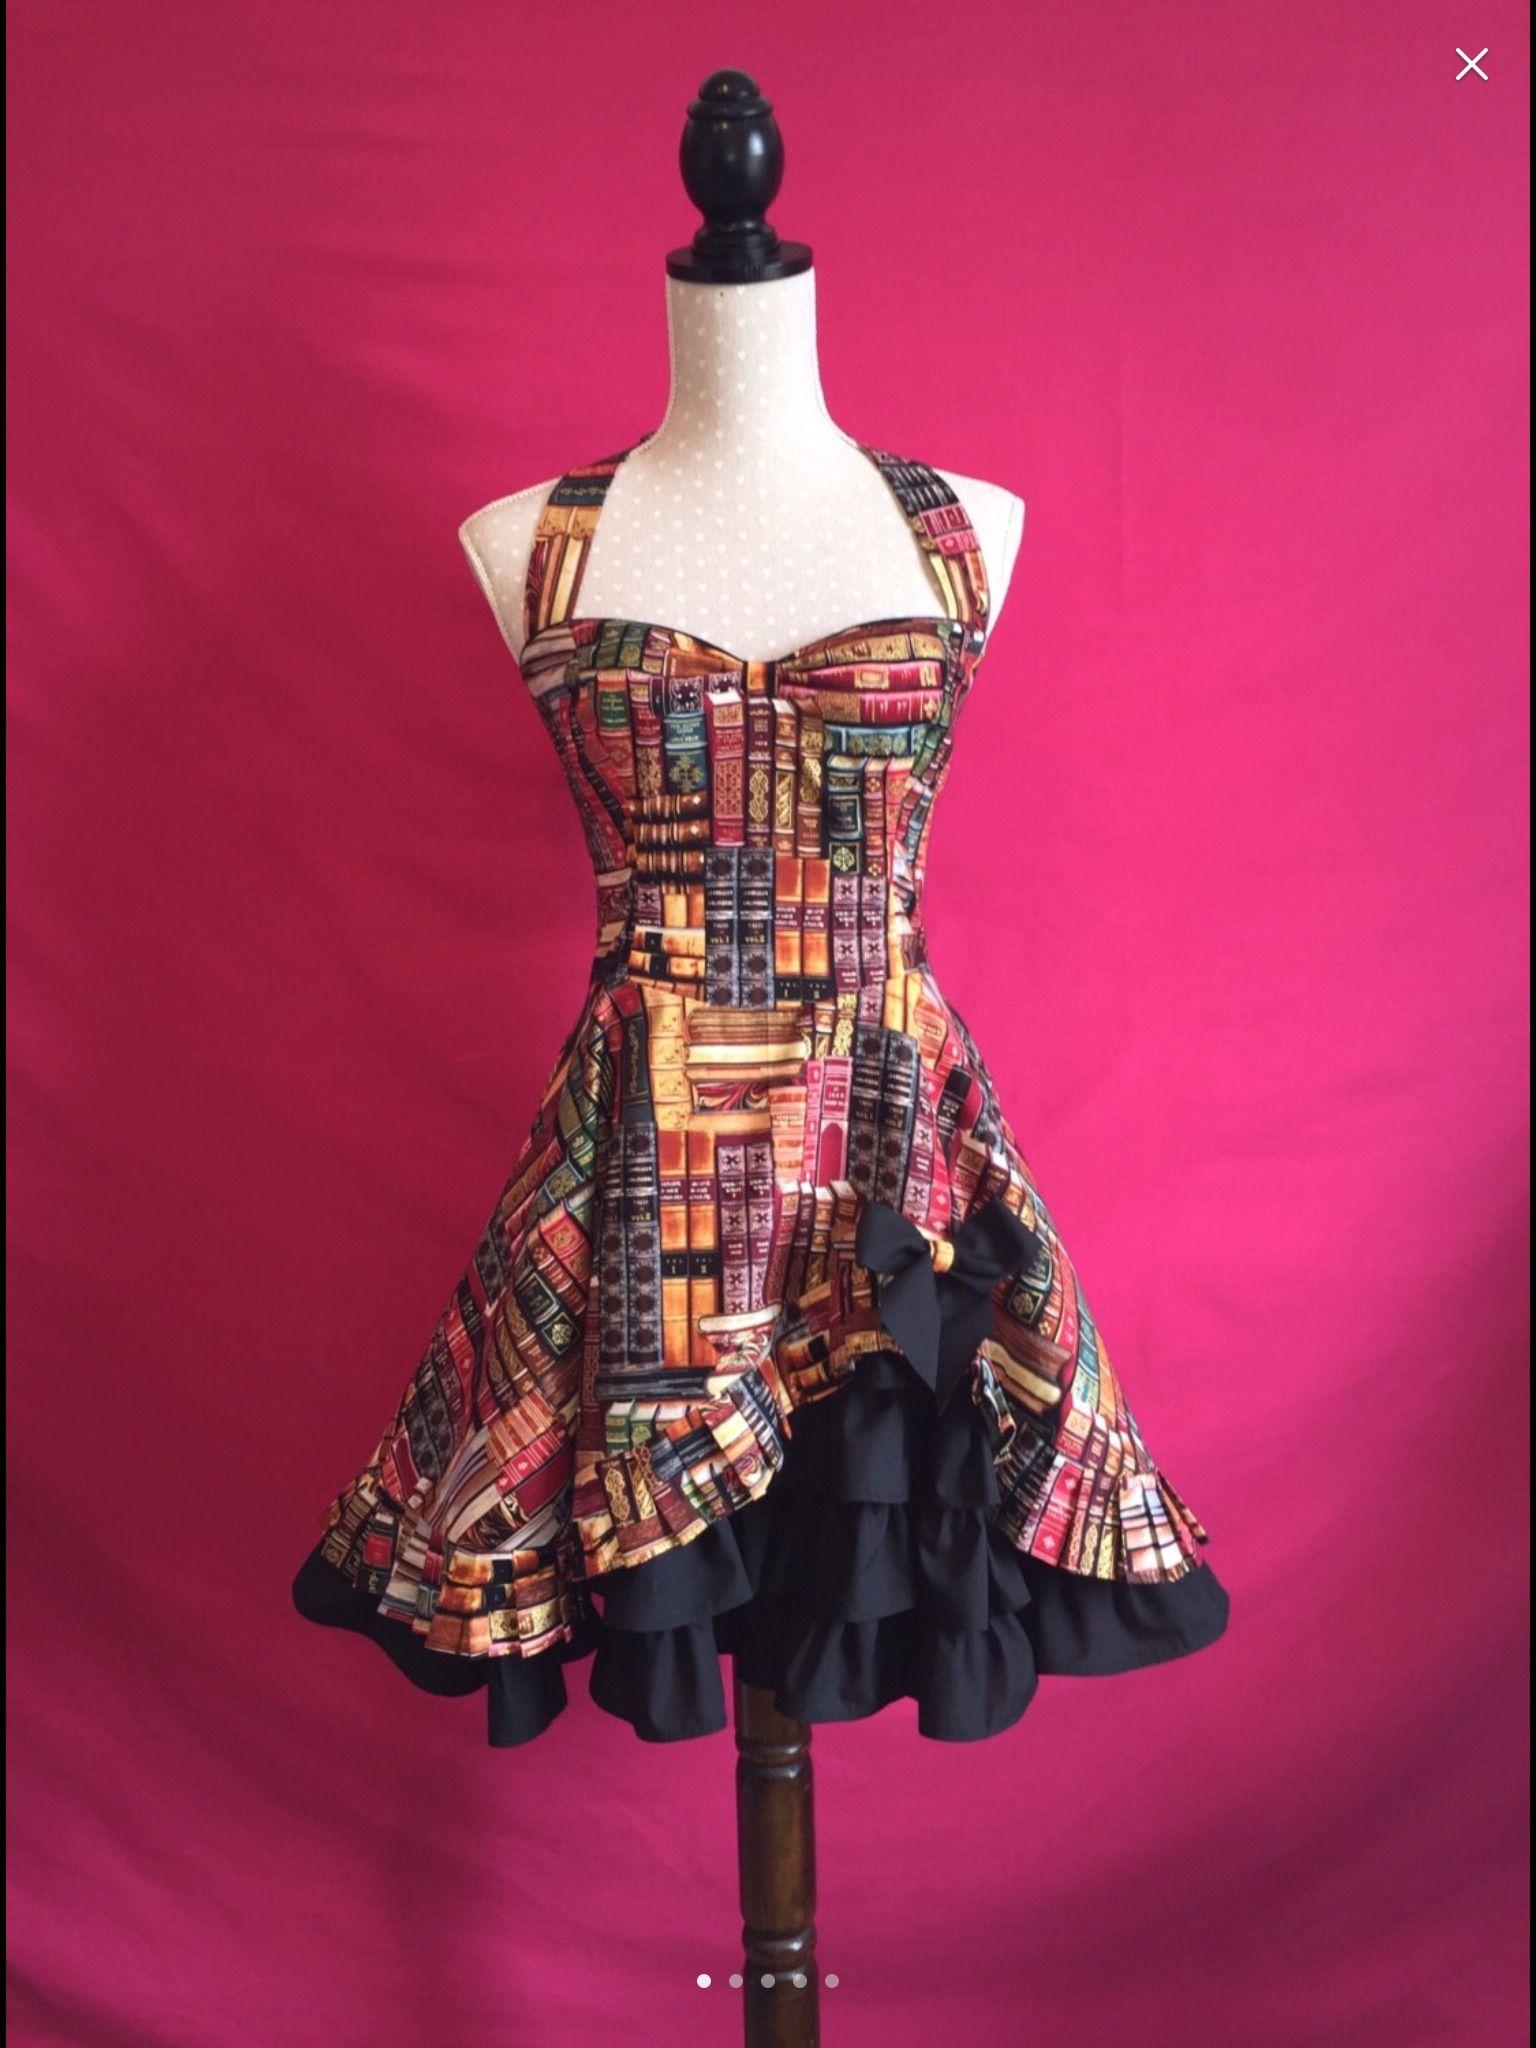 Pin de Margarita Aponte en Dresses reciclart | Pinterest